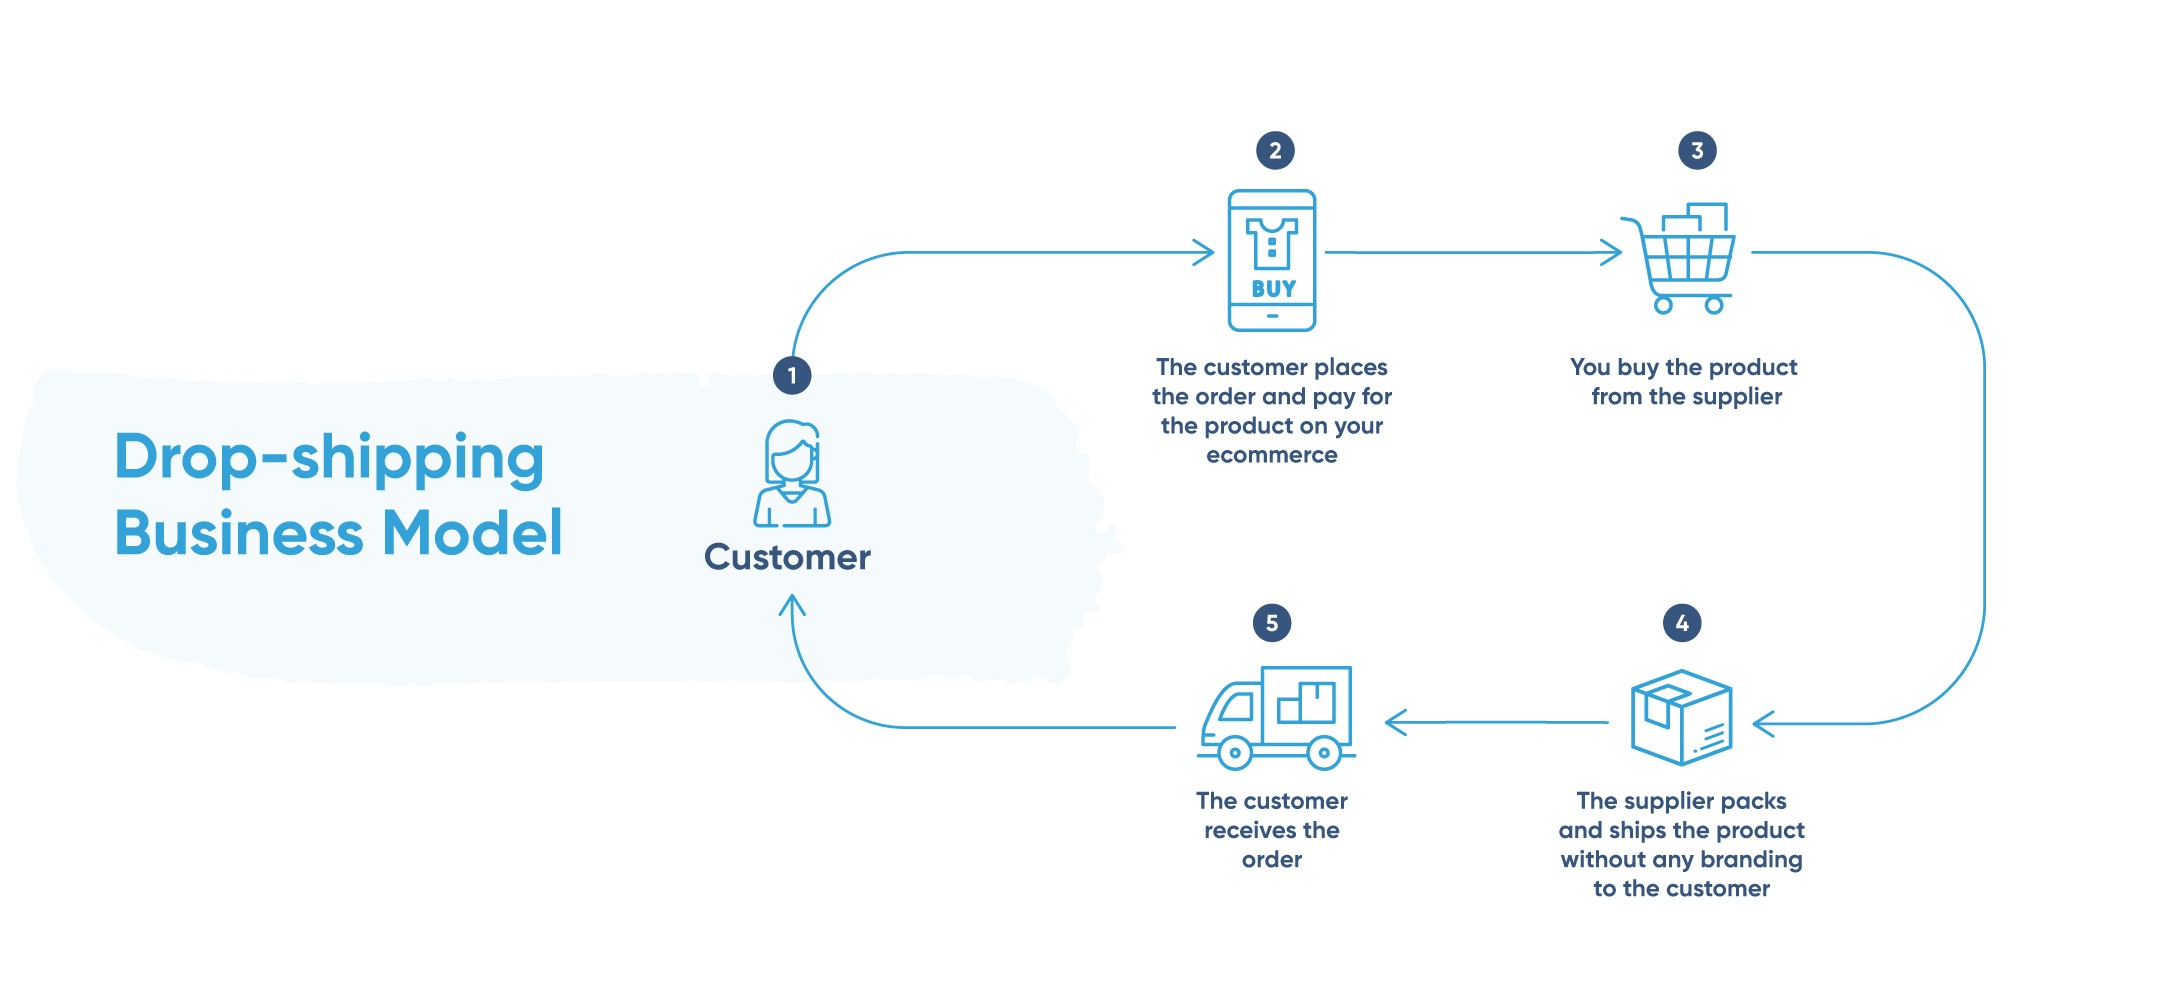 IMG_POST-Ecommerce-Business-Models-DROPSHIPPING.jpg